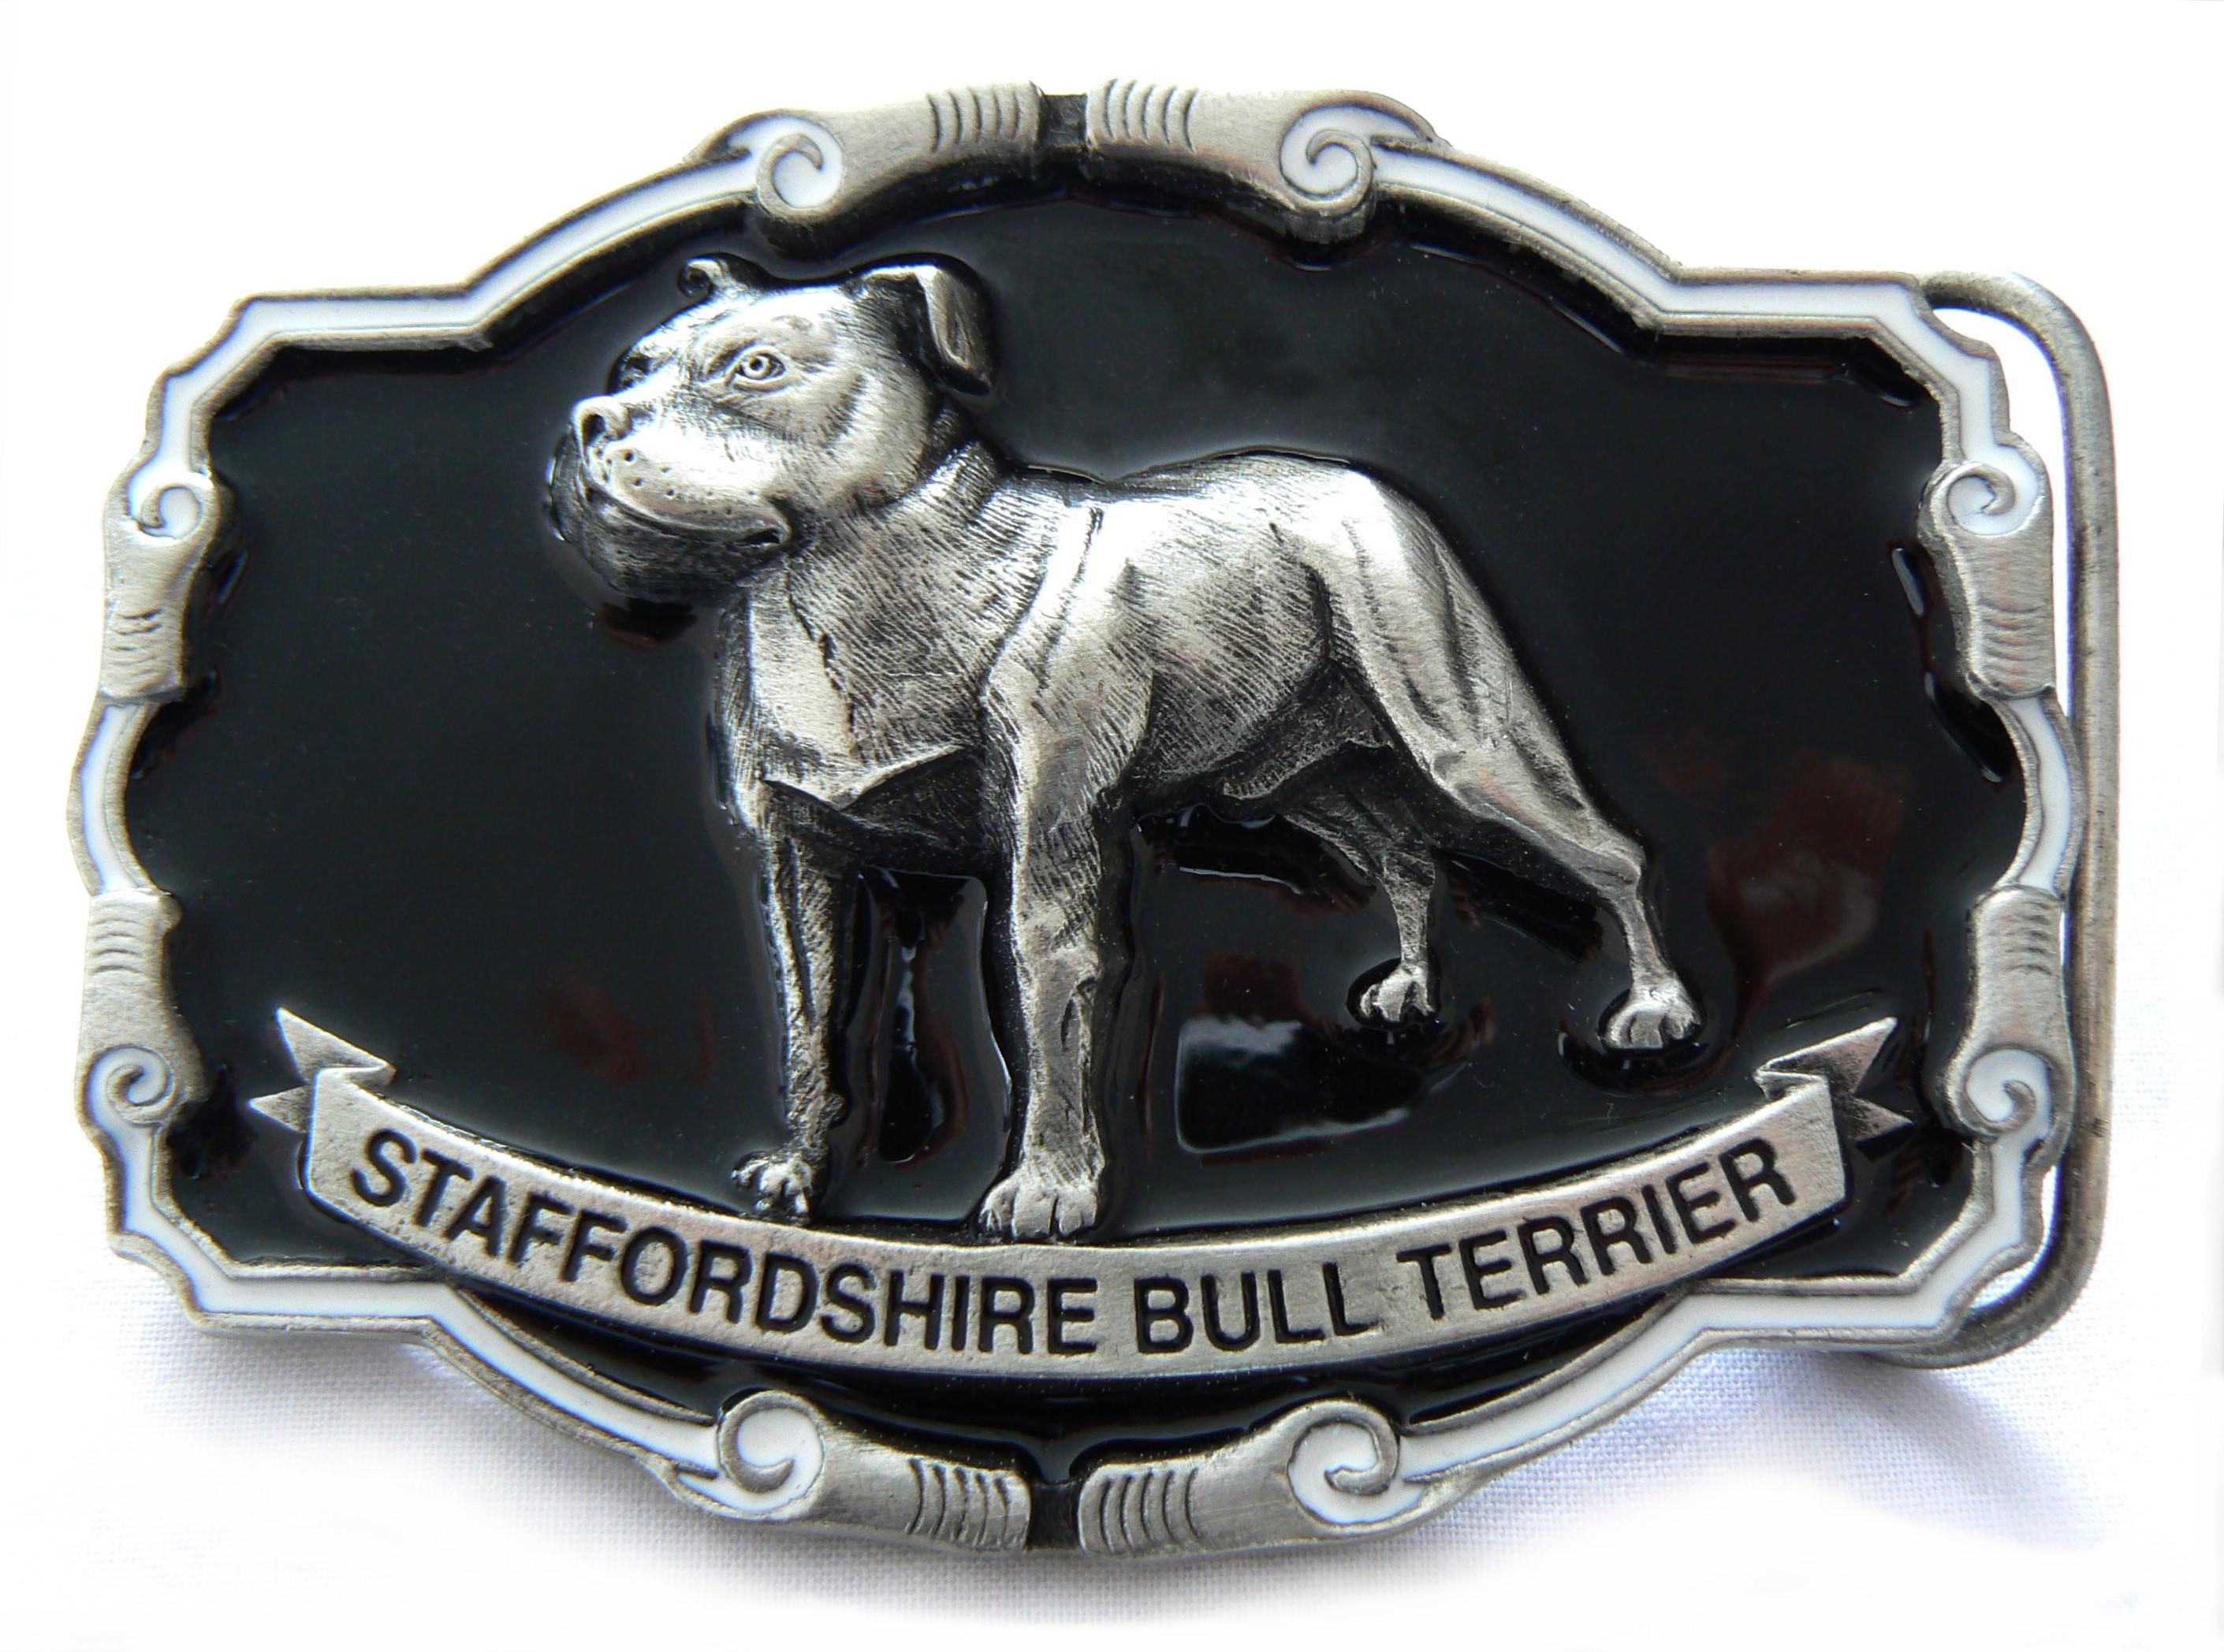 Staff Bull Terrier Buckle